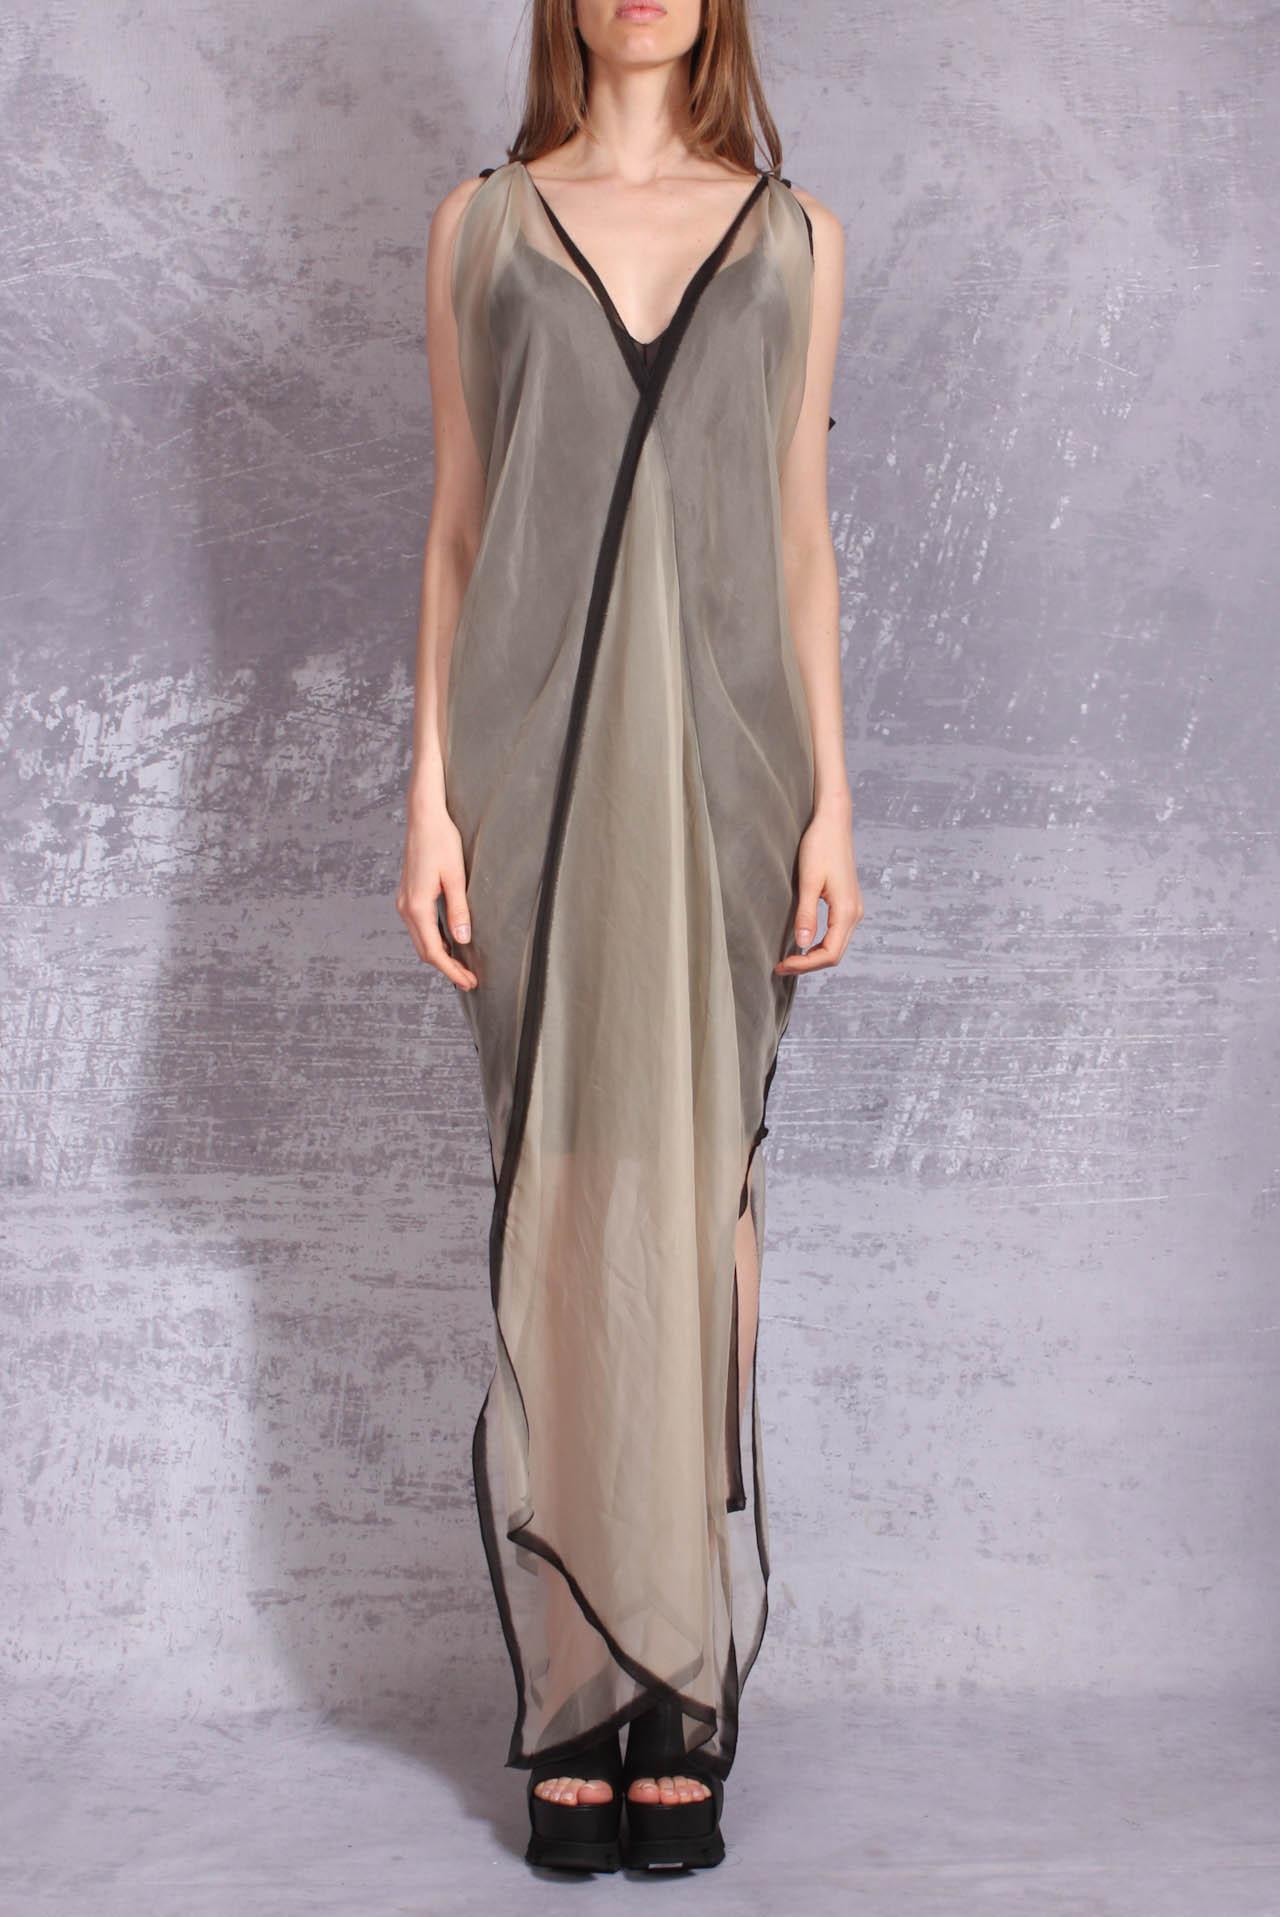 Atelierseptiem dress